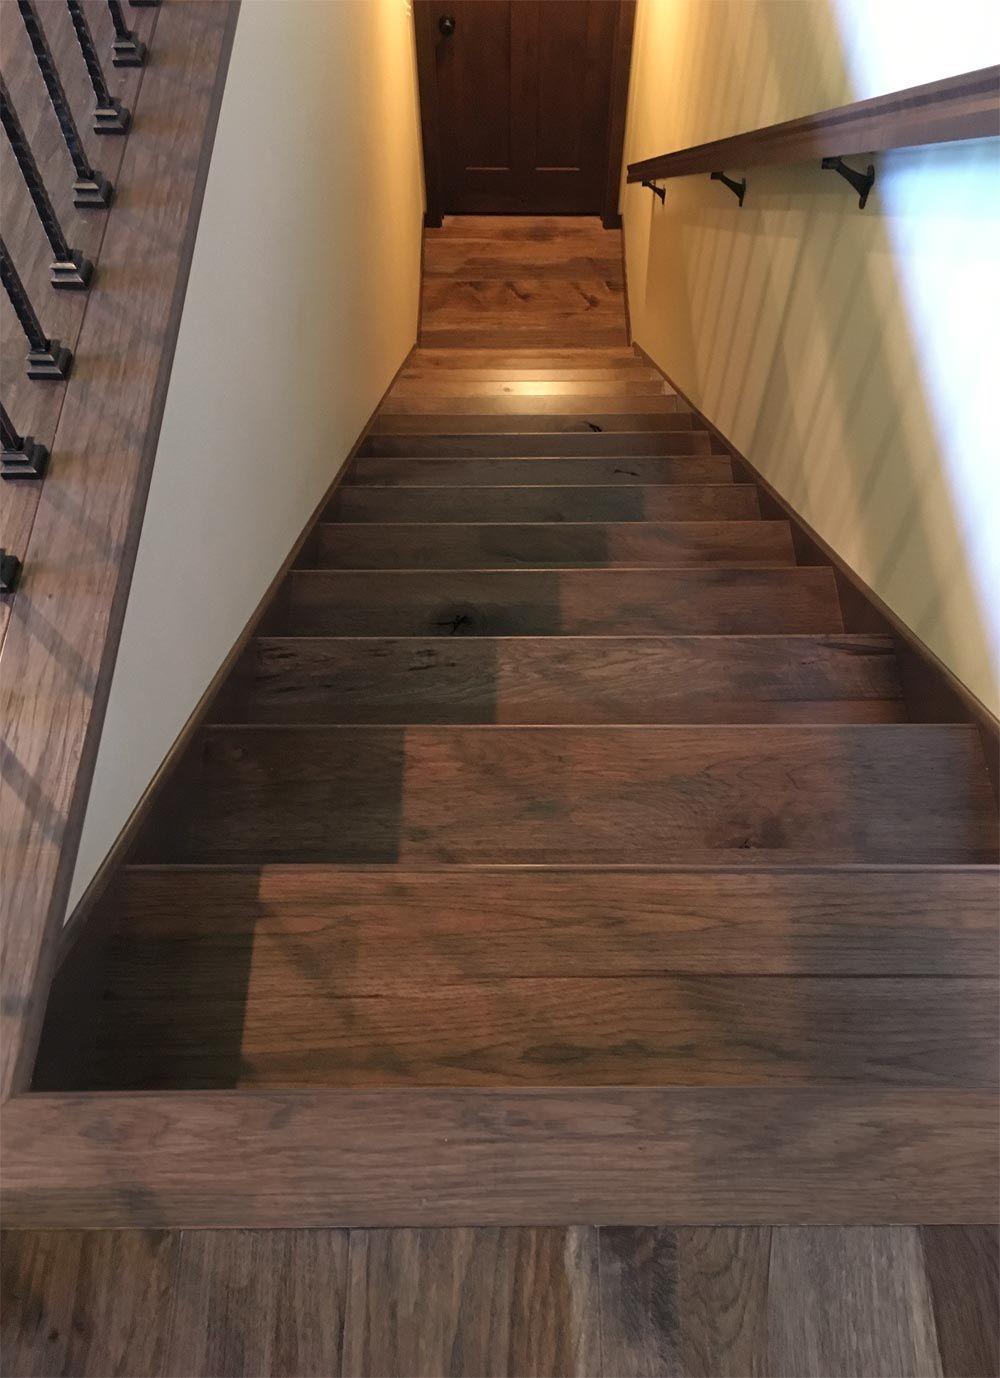 Hand Scraped Hickory Stair Treads Stair Treads Stairs Hardwood | Hand Scraped Stair Treads | Tread Width | Brazilian Cherry | Stair Parts | Hardwood Floors | Laminate Flooring